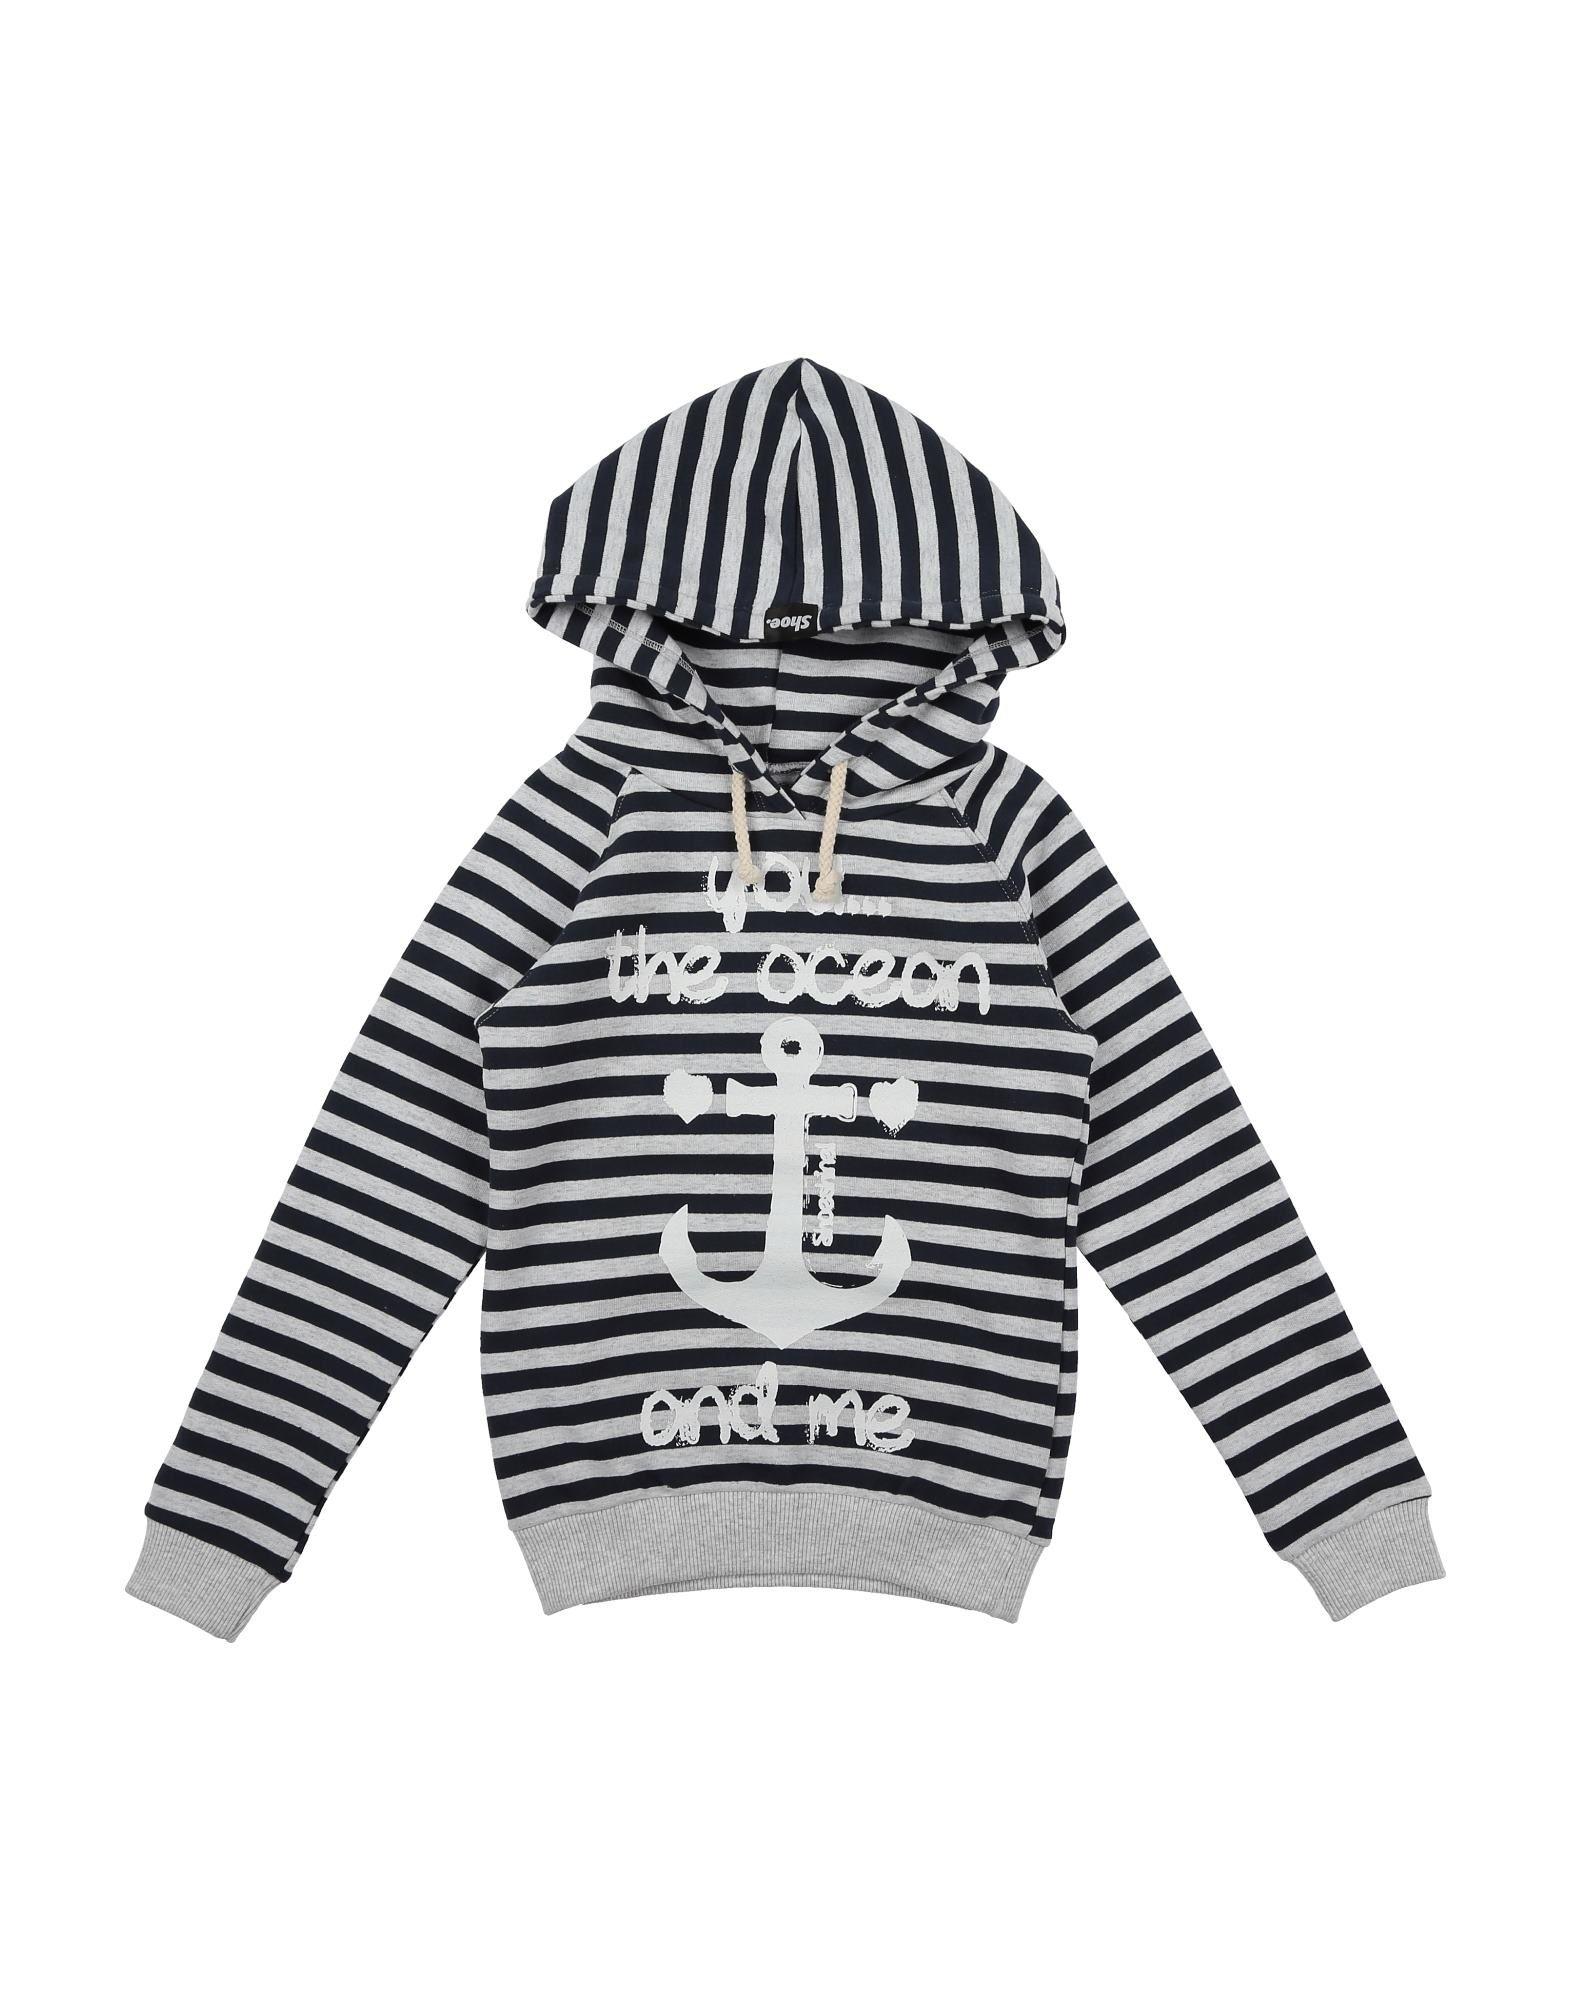 Shoeshine Kids' Sweatshirts In Light Grey